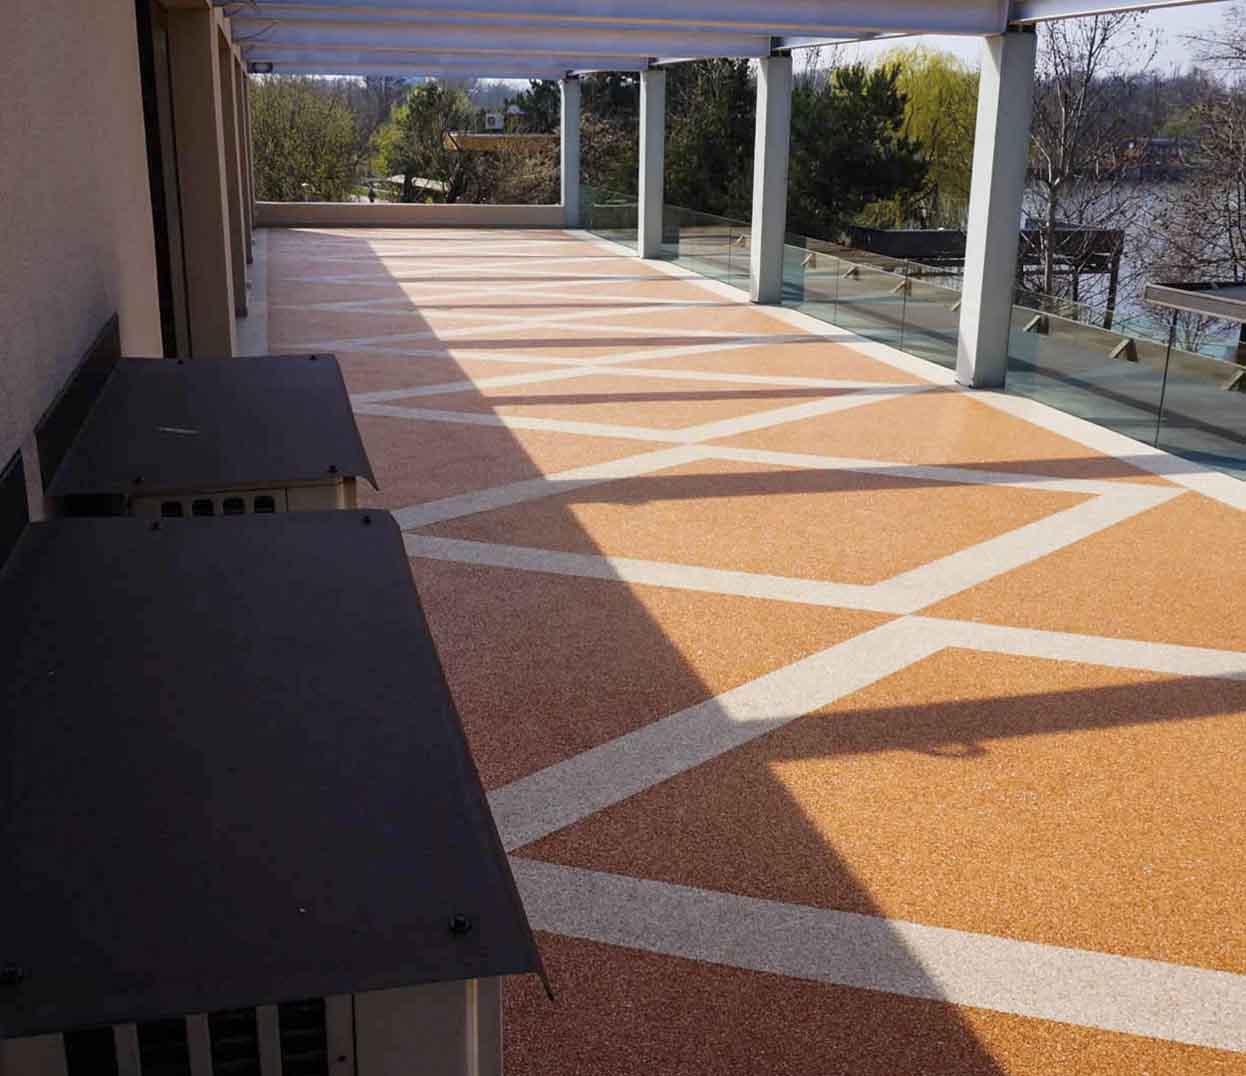 viarustik-stone-carpet 11